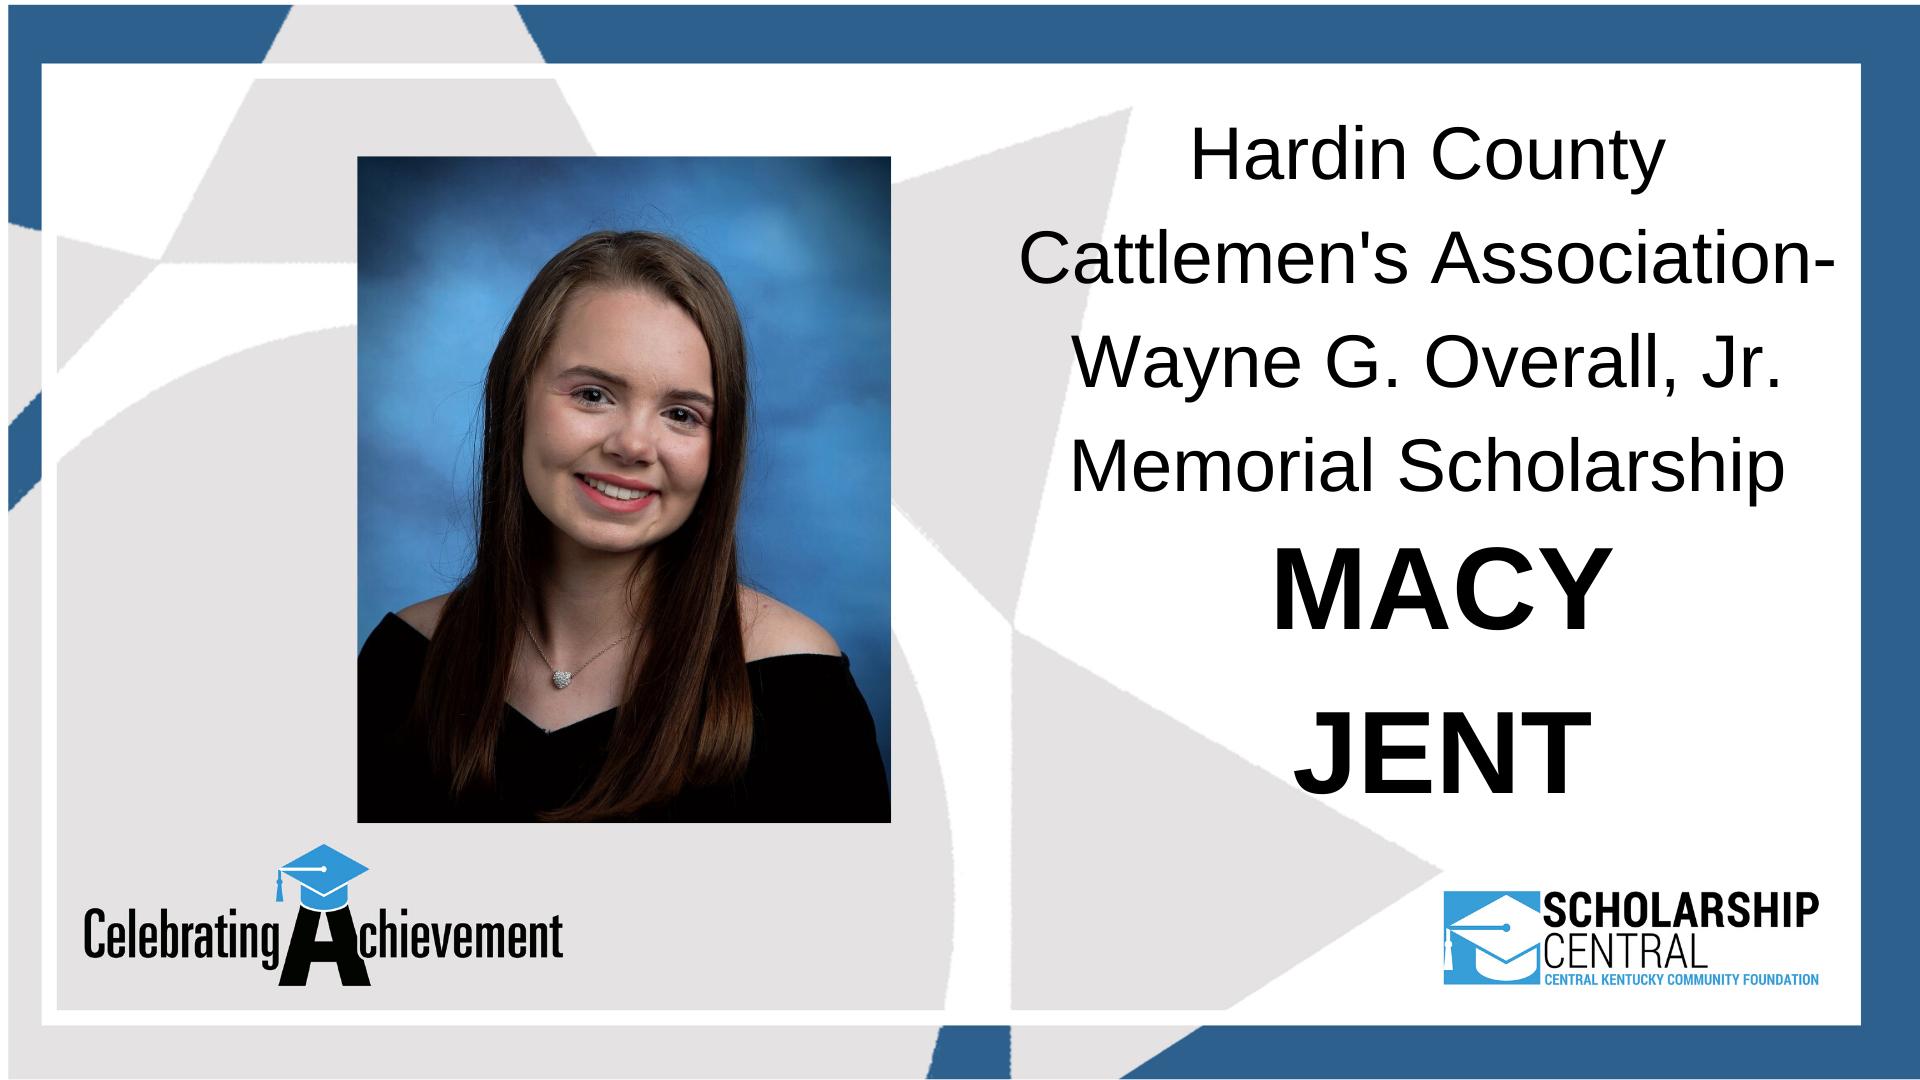 HC Cattleman Wayne G. Overall Scholarship